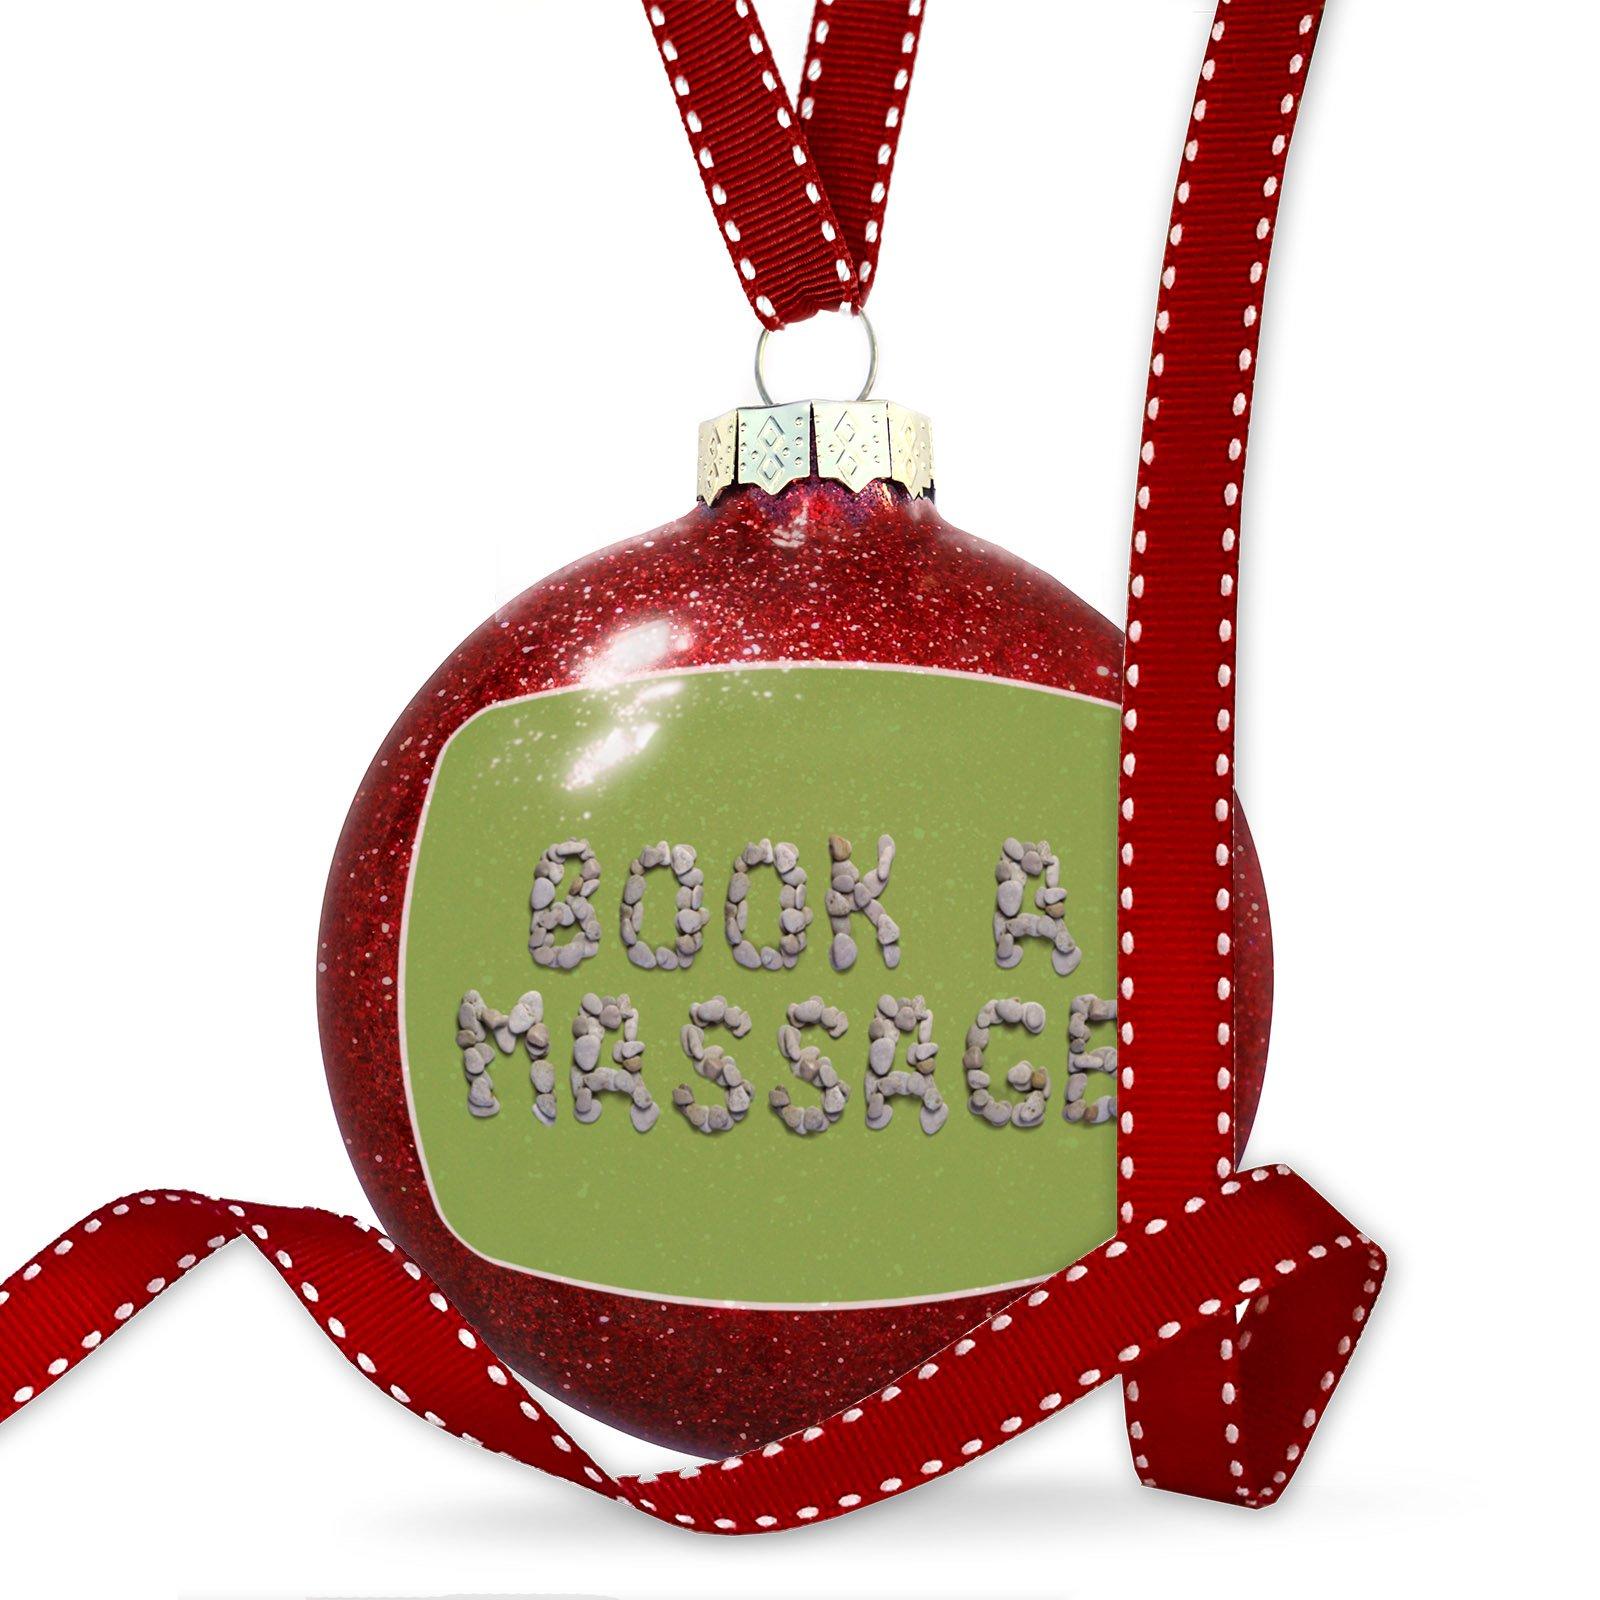 Christmas Decoration Book A Massage Spa Stones Rocks Ornament